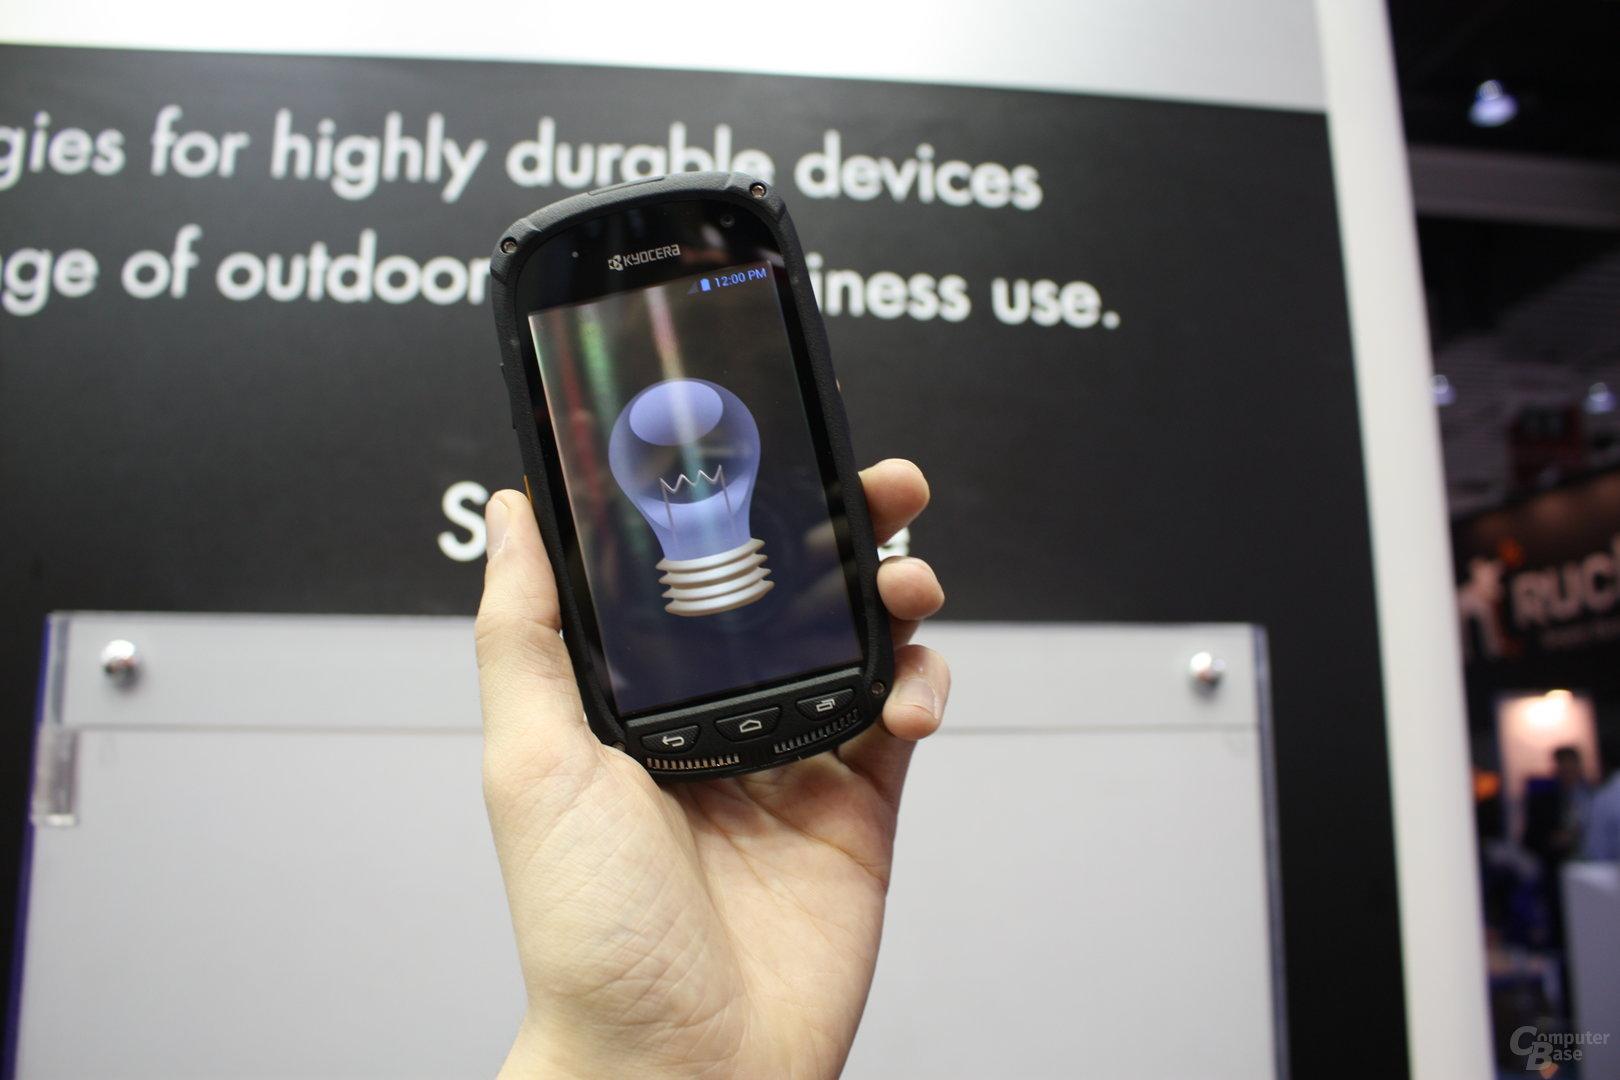 Prototyp des Kyocera-Smartphones mit Solarzellen unter dem Touchscreen